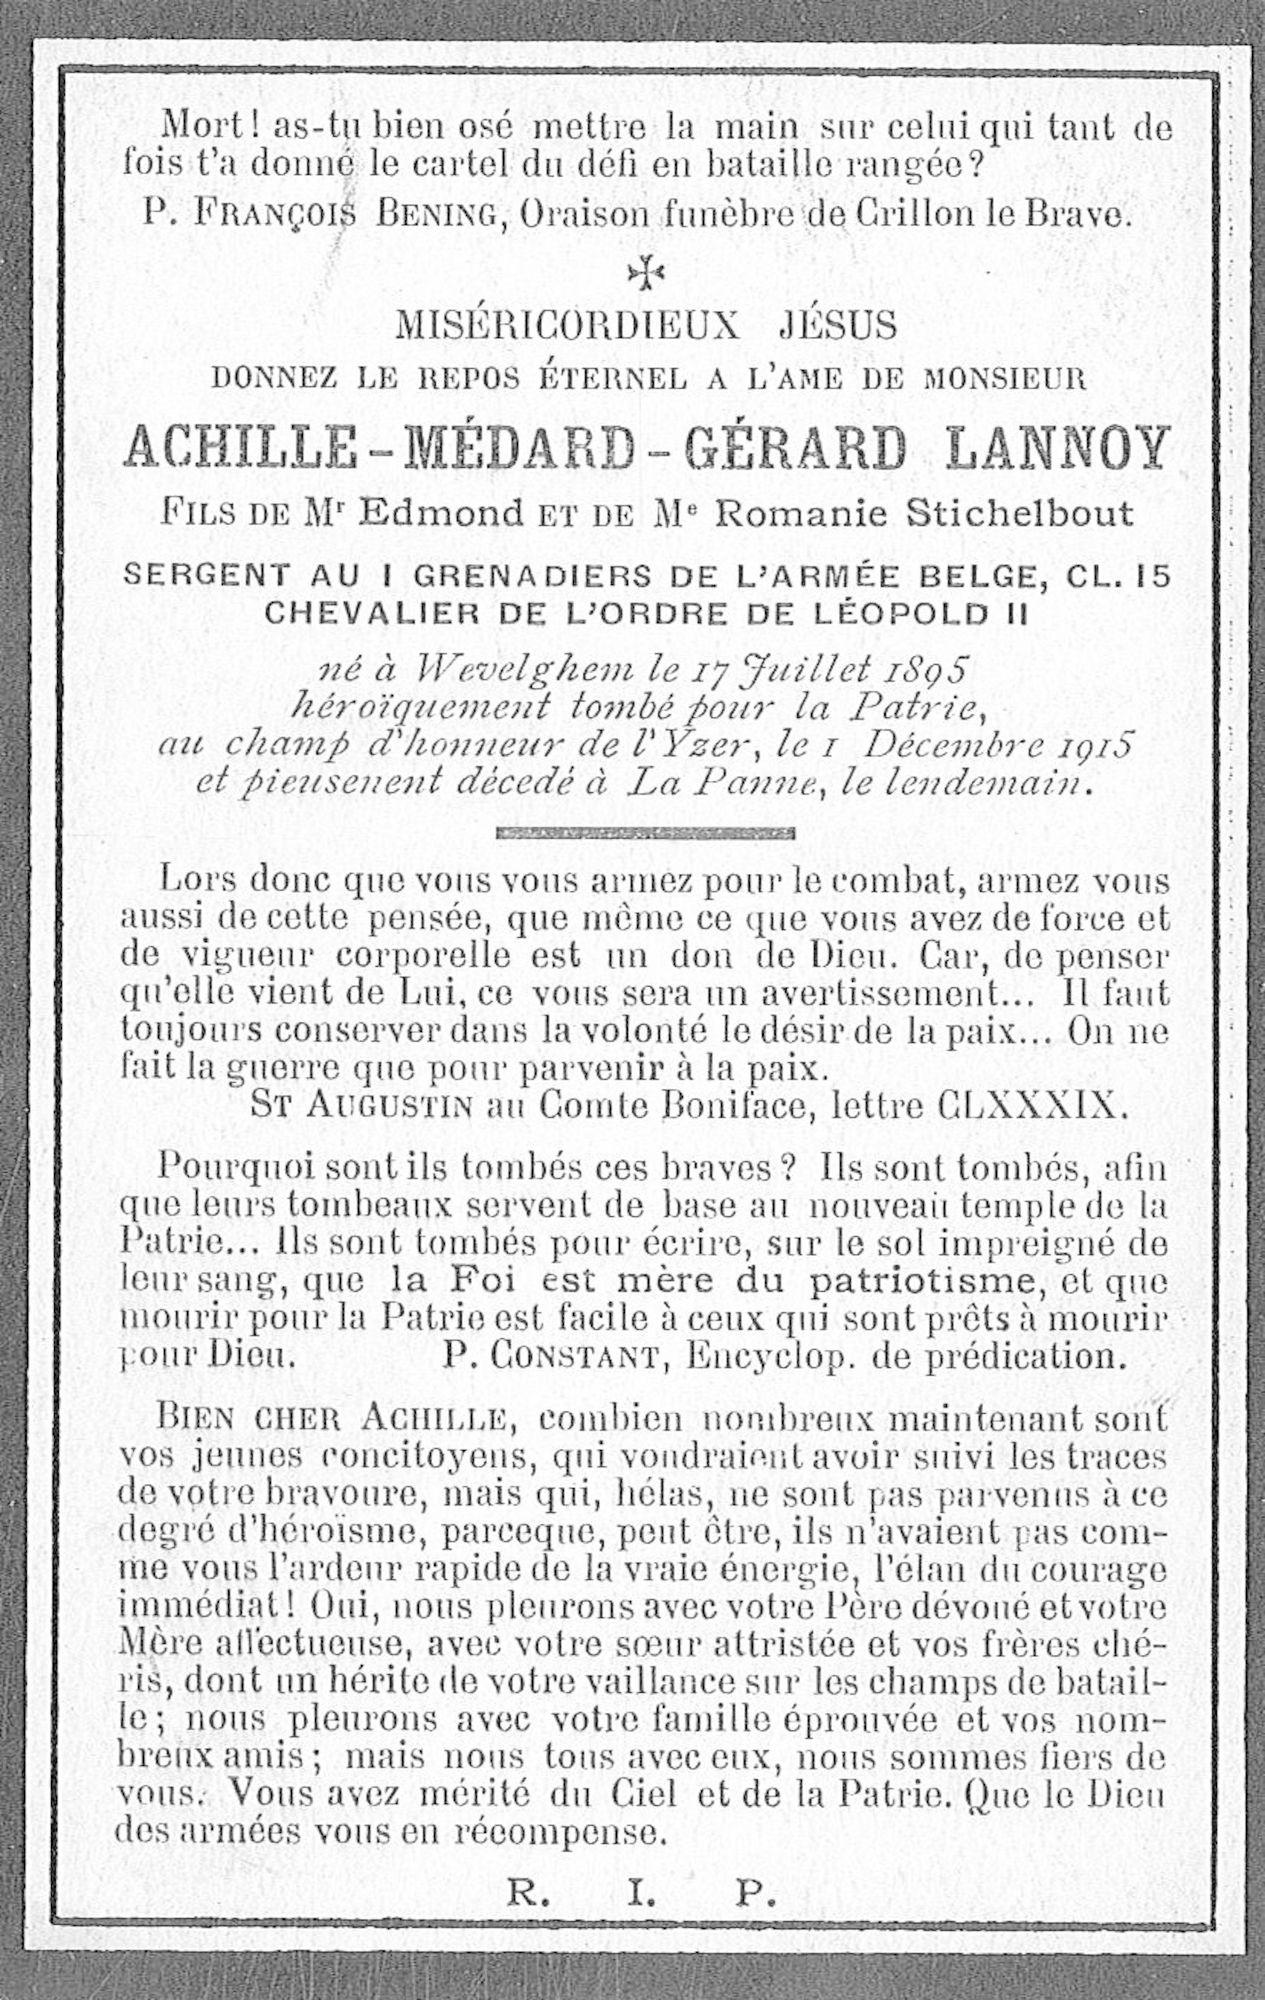 Achille Médard Gérard Lannoy